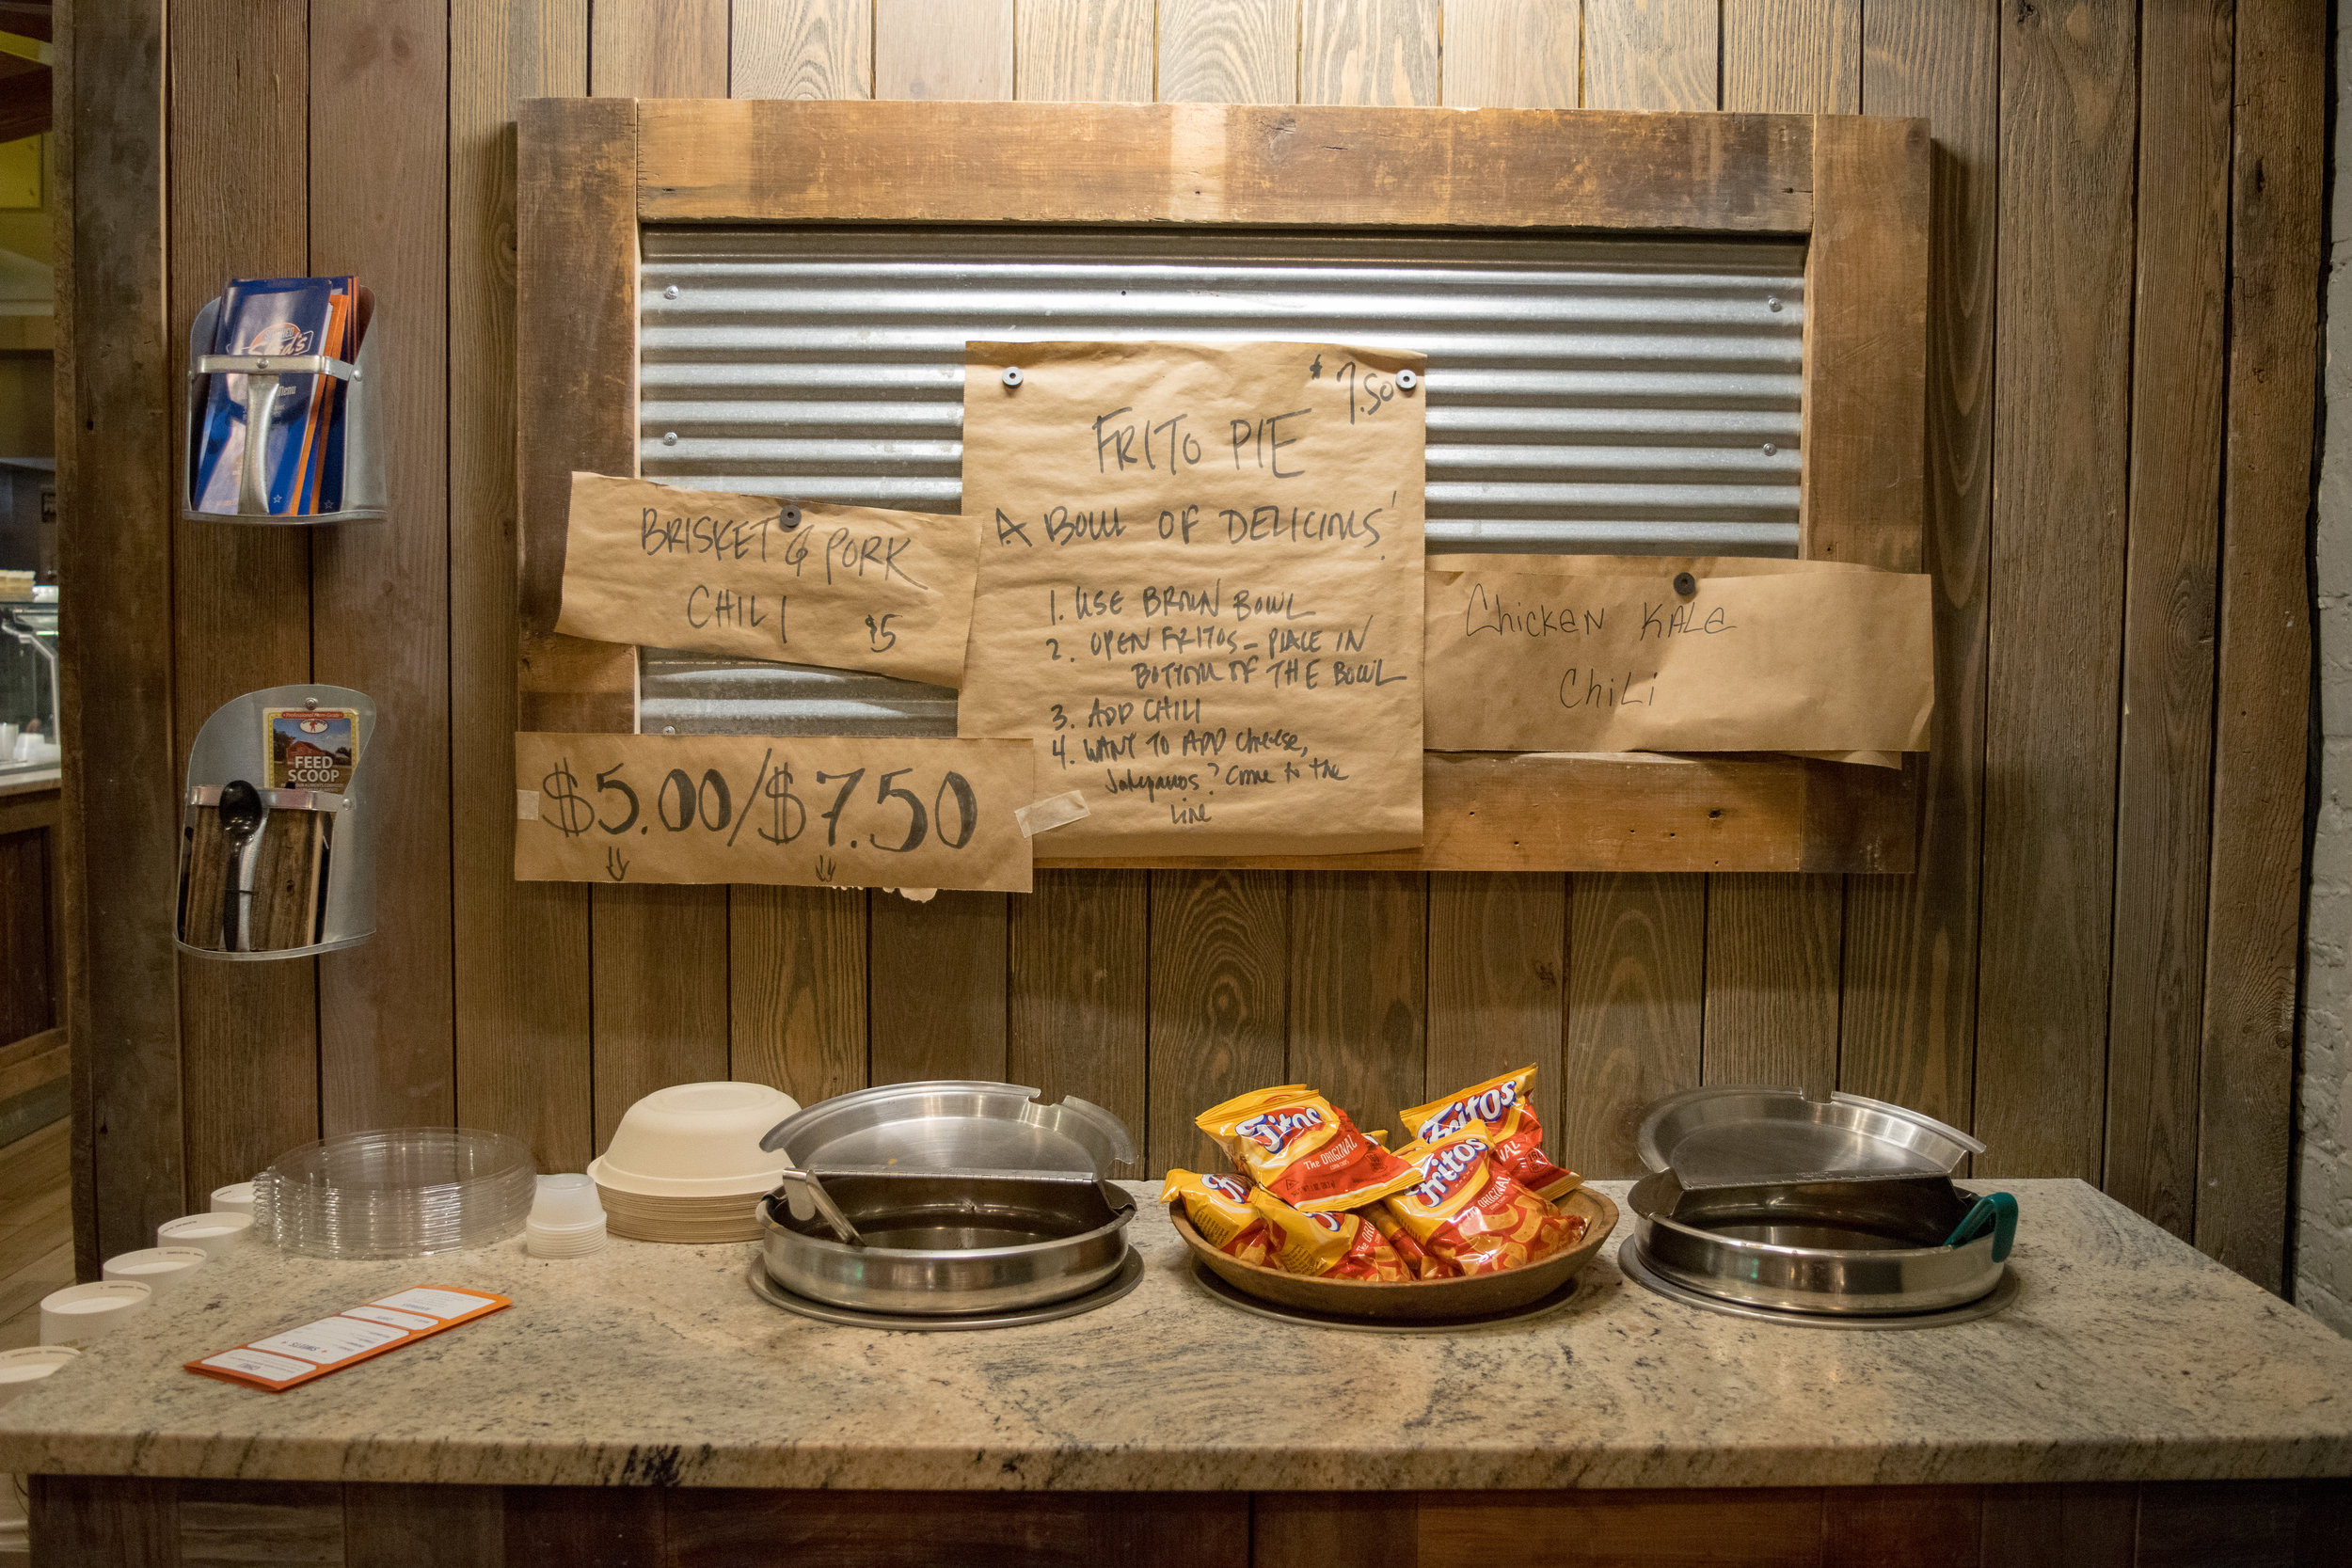 Do-it-yourself Frito Pie bar